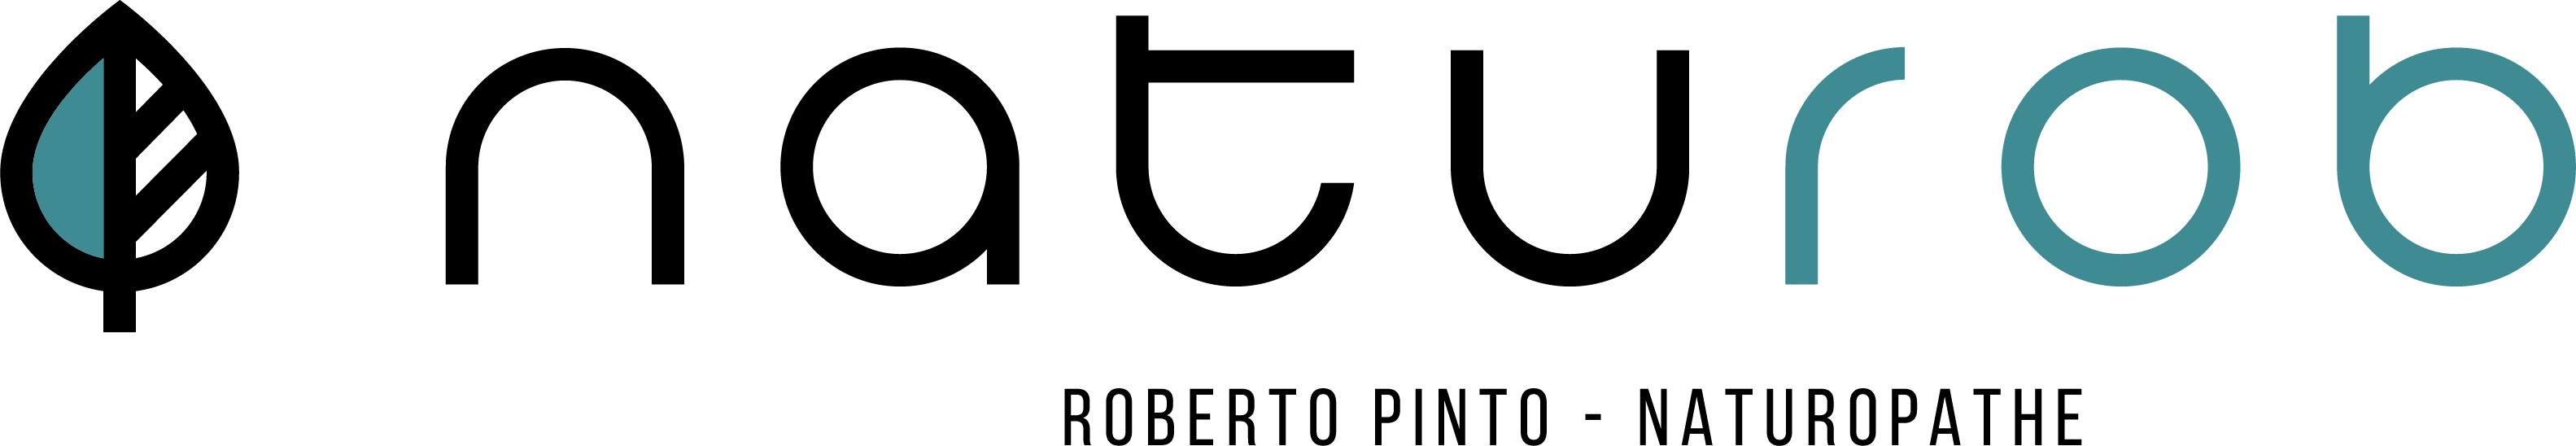 Naturob_logo4